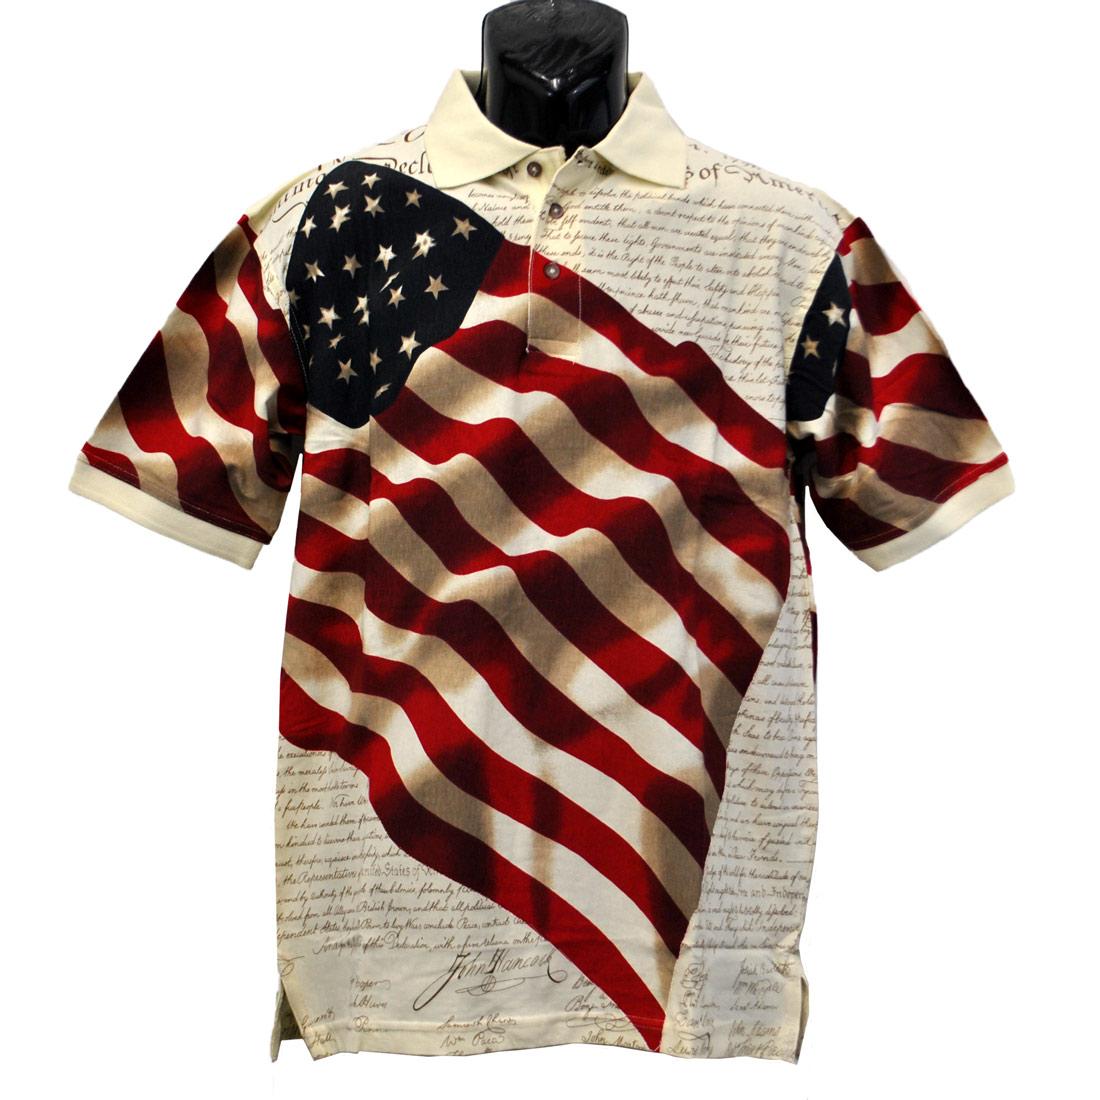 6f356b8a Constitution Flag Shirt